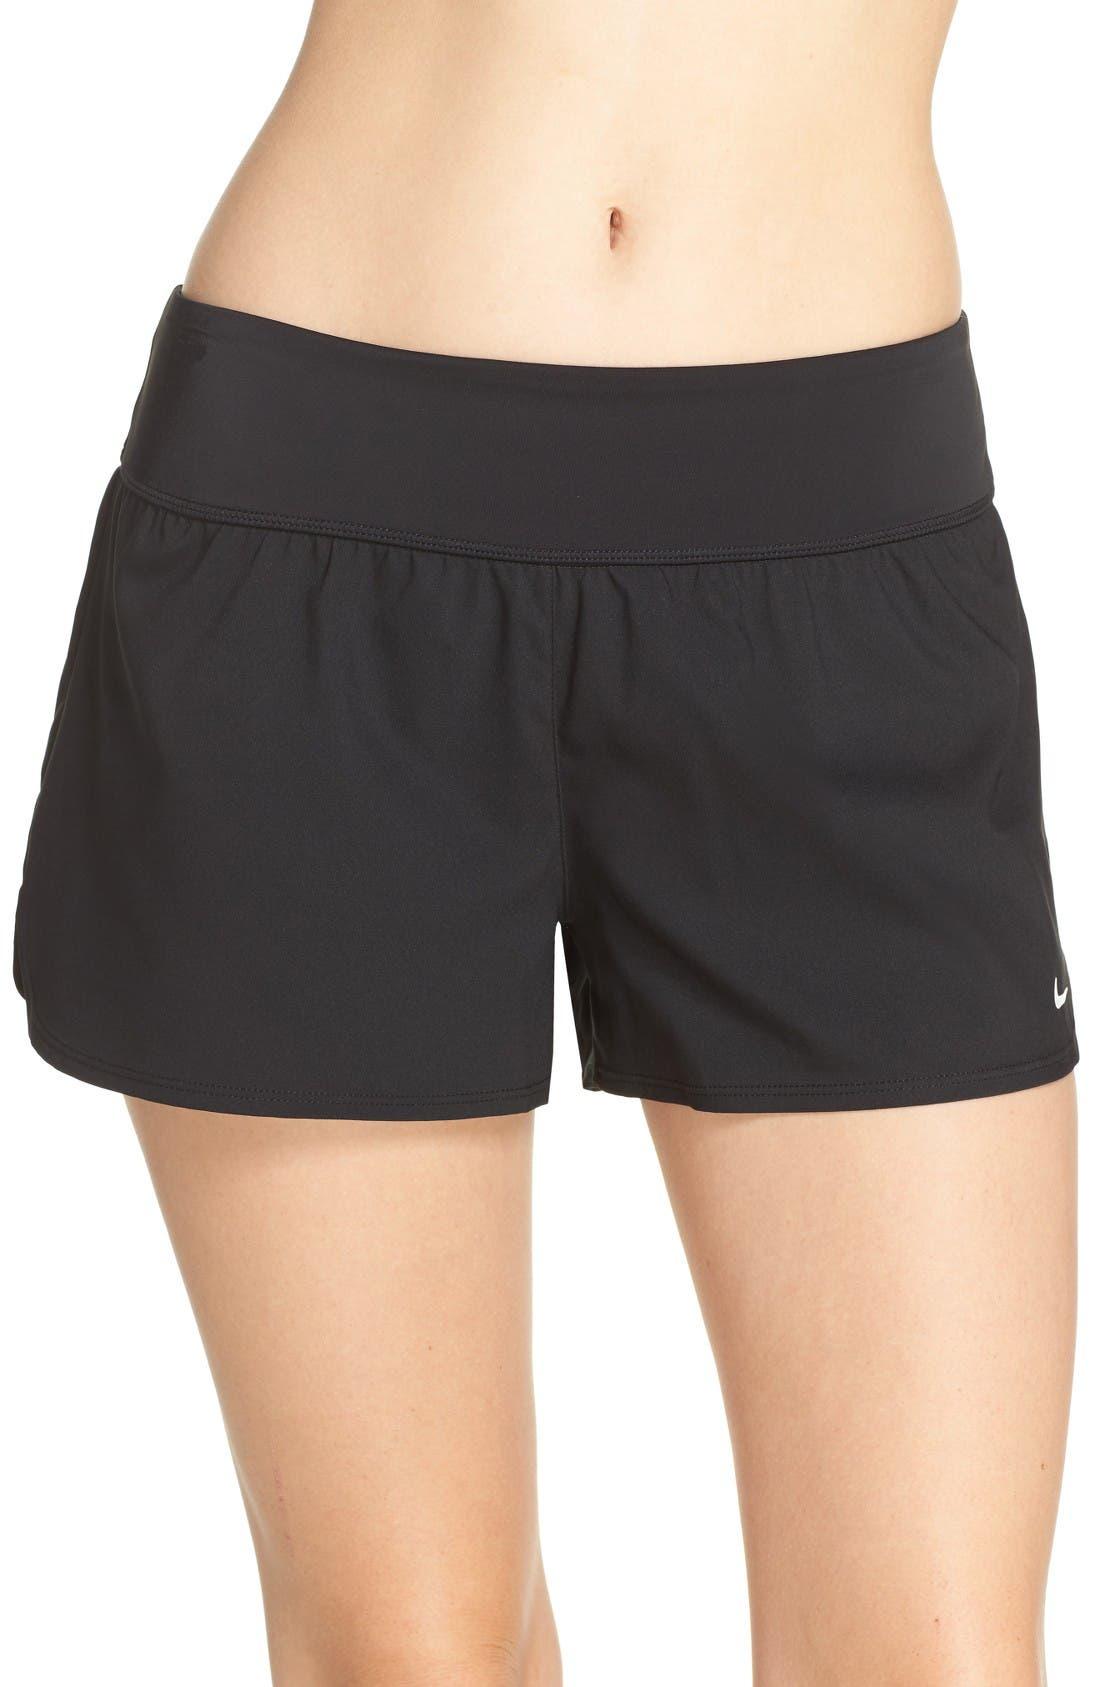 Nike Core Swim Board Shorts